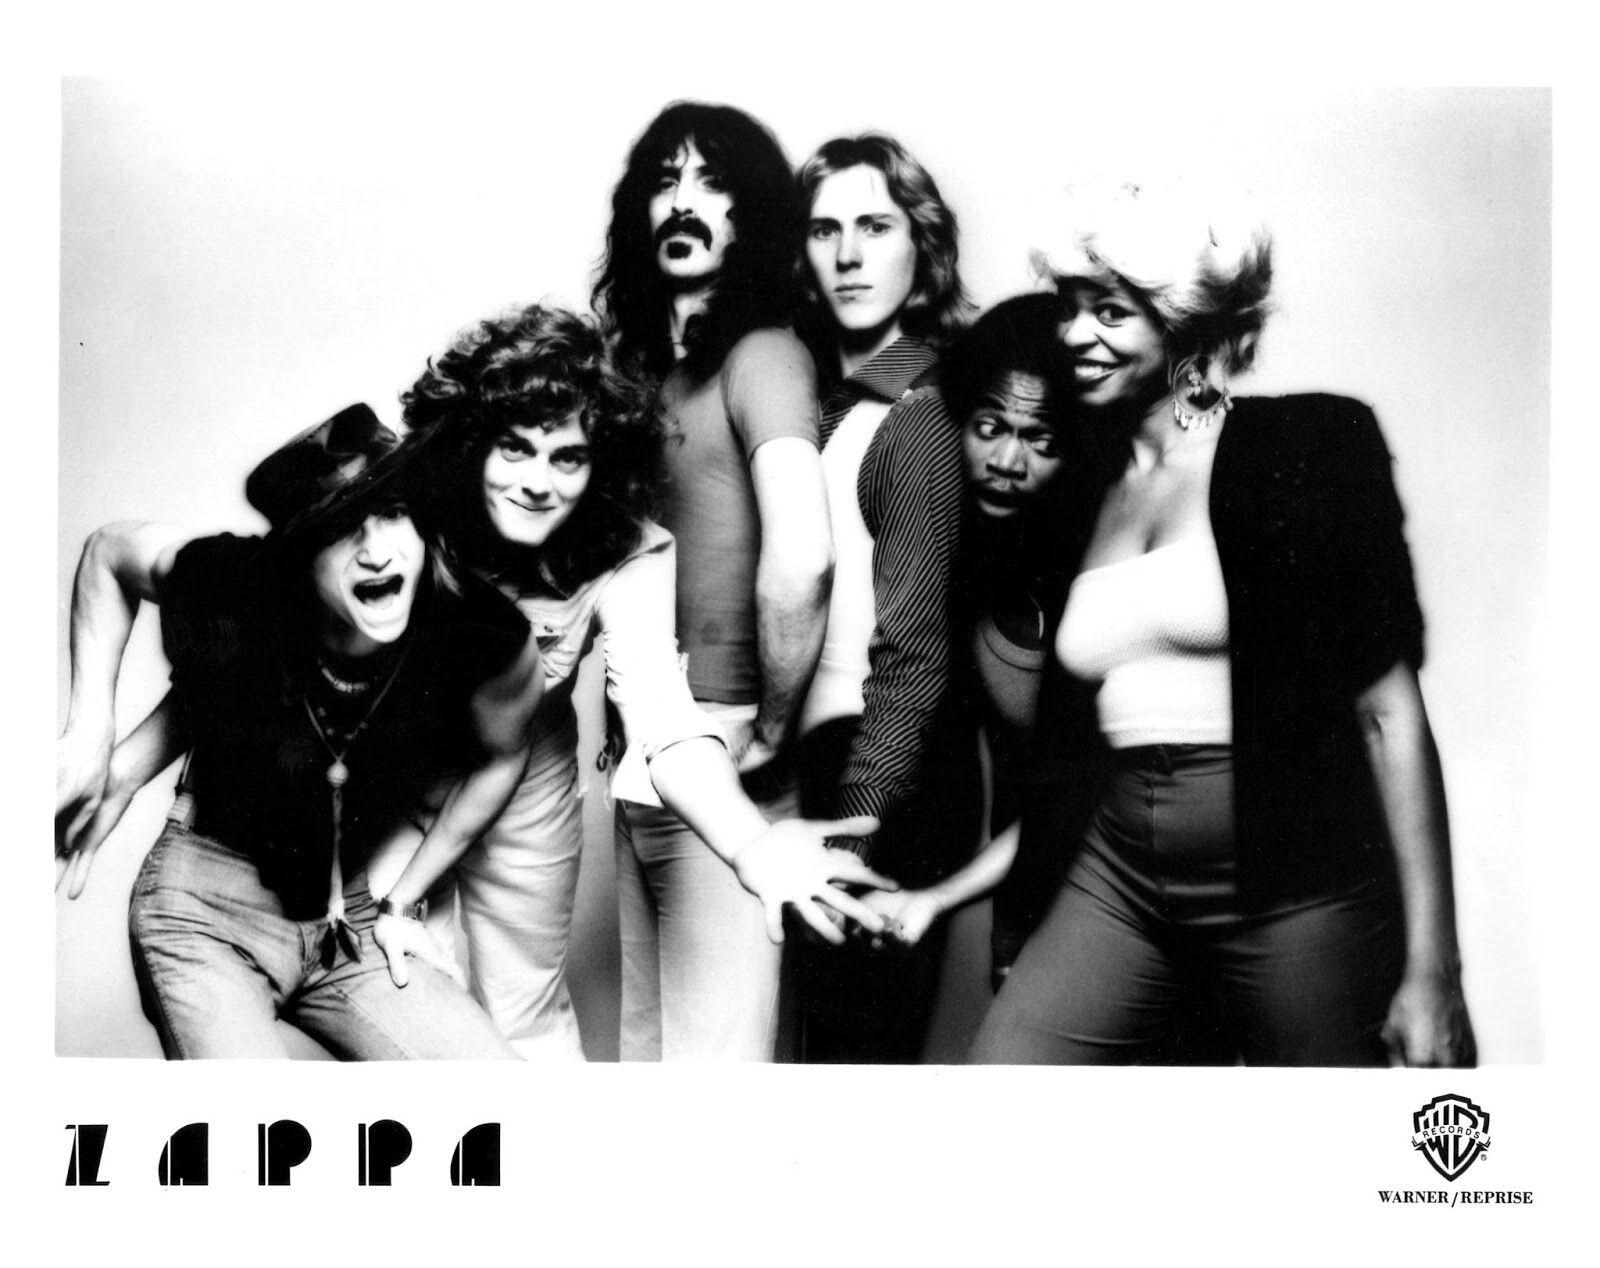 Frank Zappa Happy Birthday intended for terry bozzio, patrick o'hern, eddie jobson frank zappa band 1976